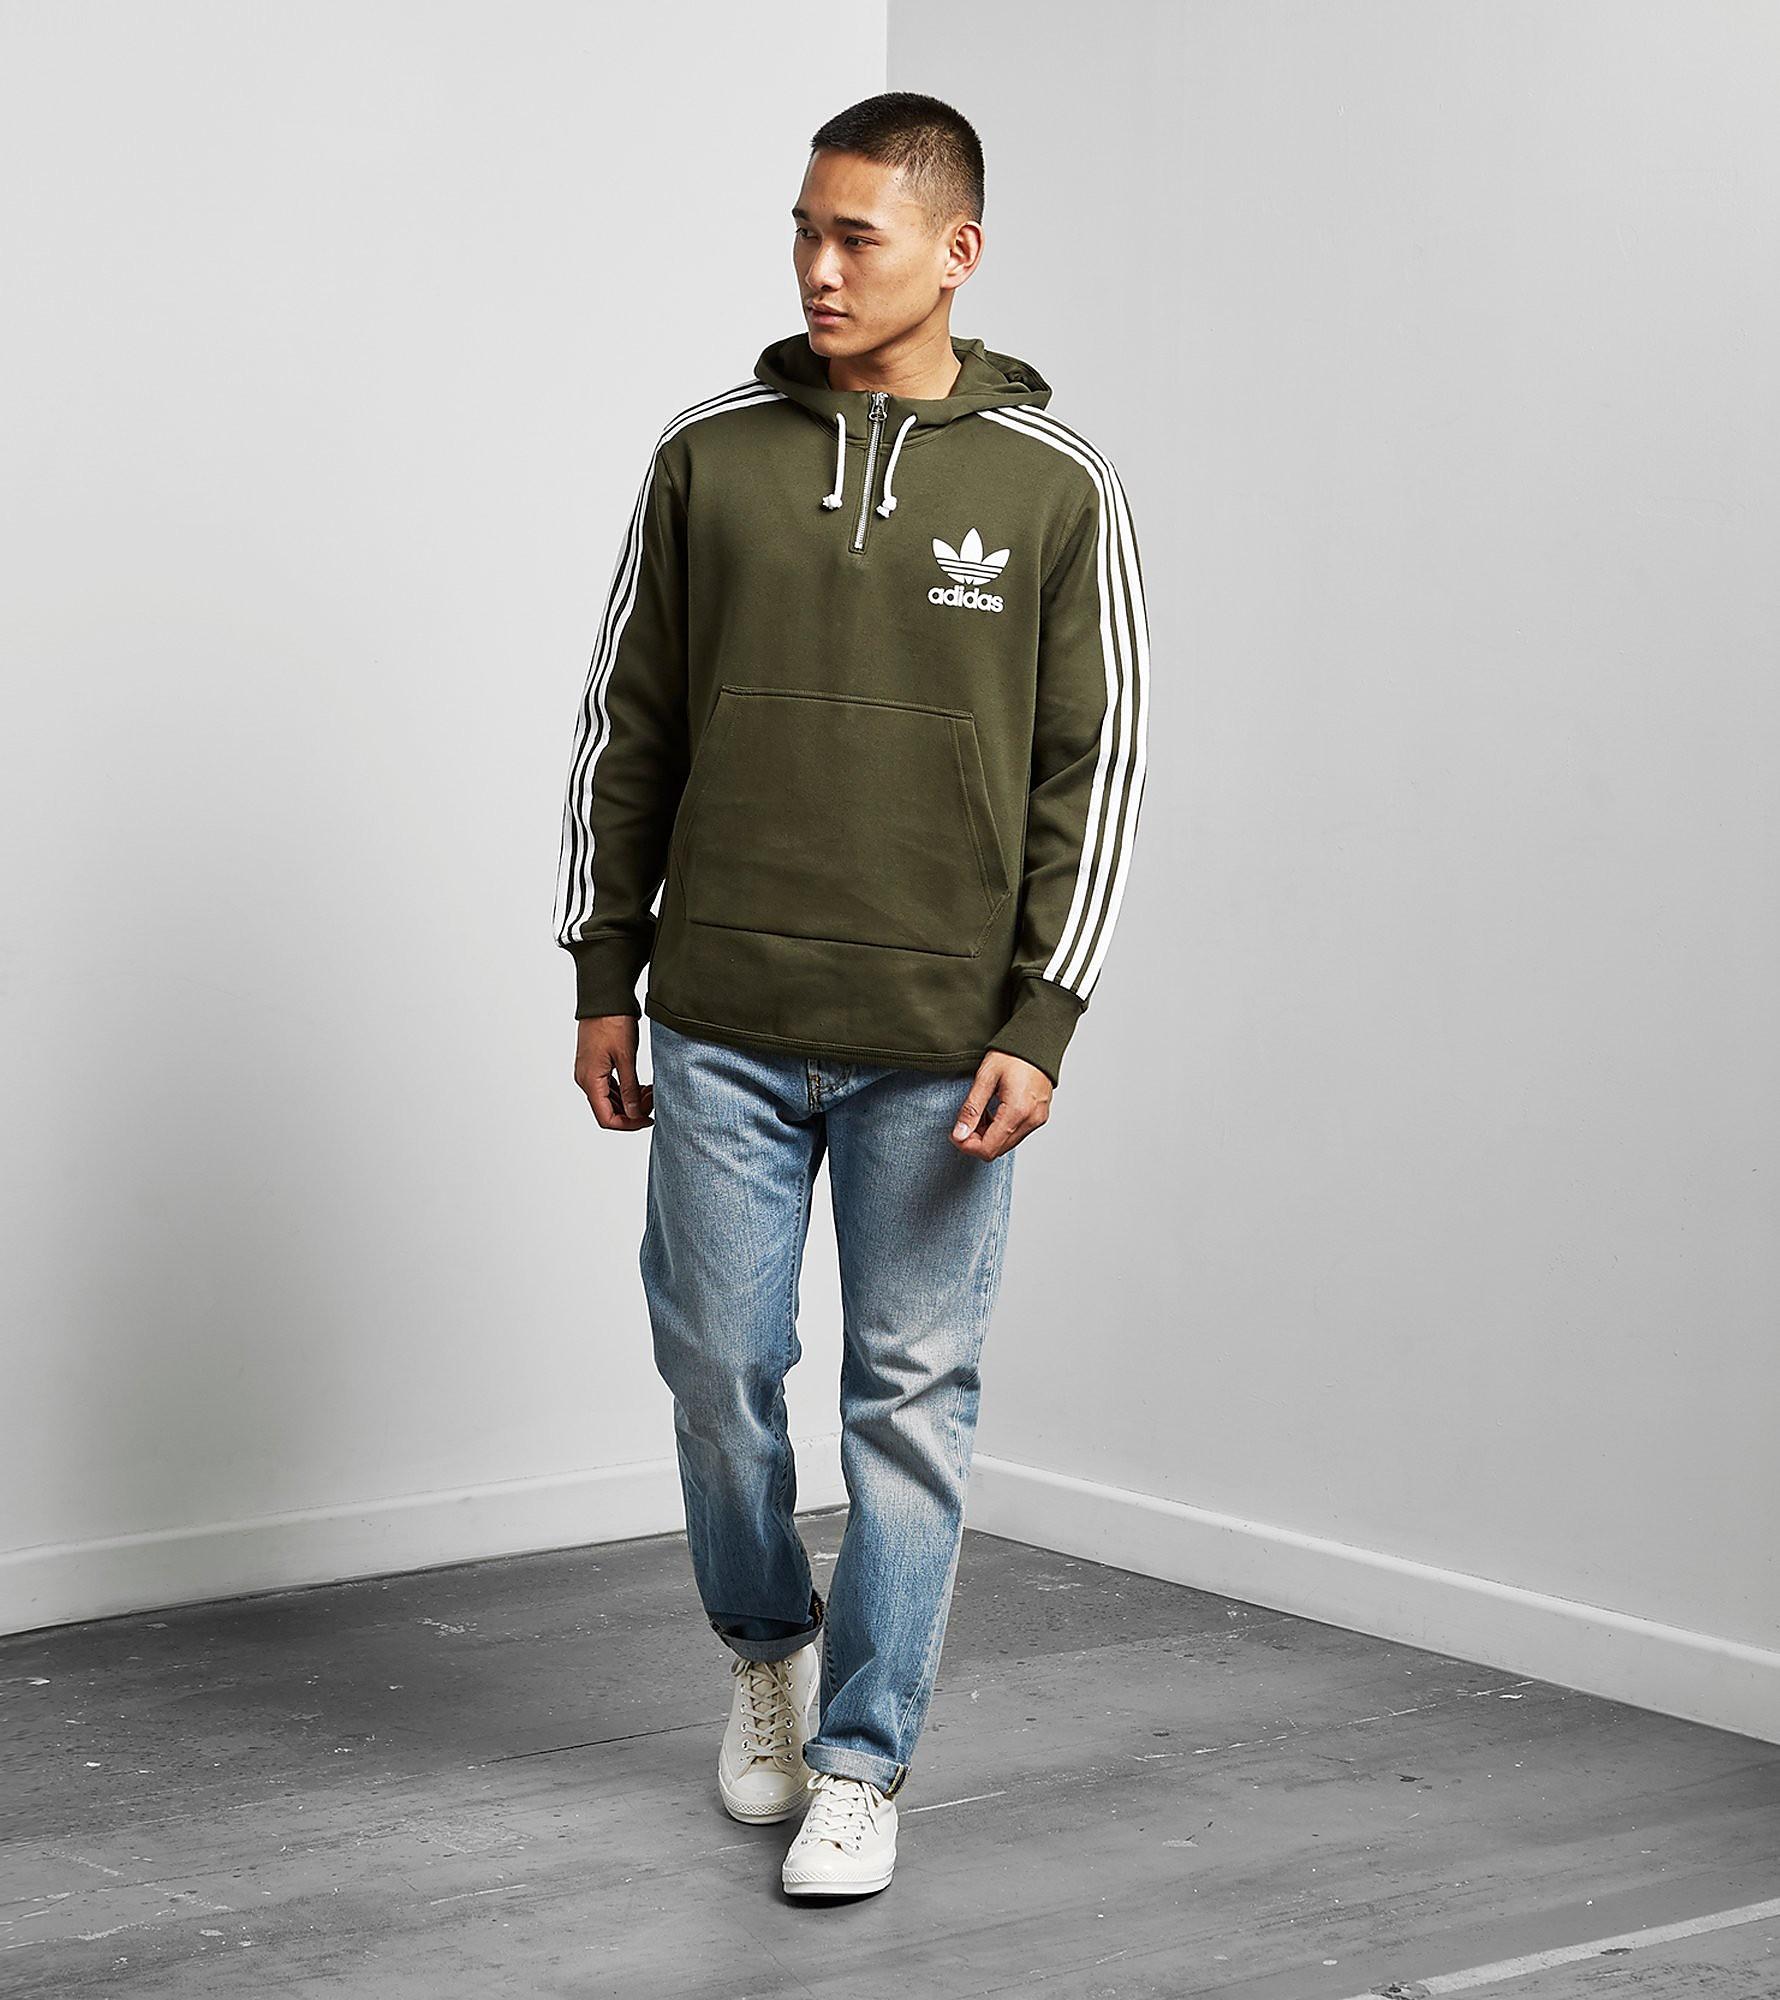 adidas Originals ADC Half-Zip Hoody - size? Exclusive